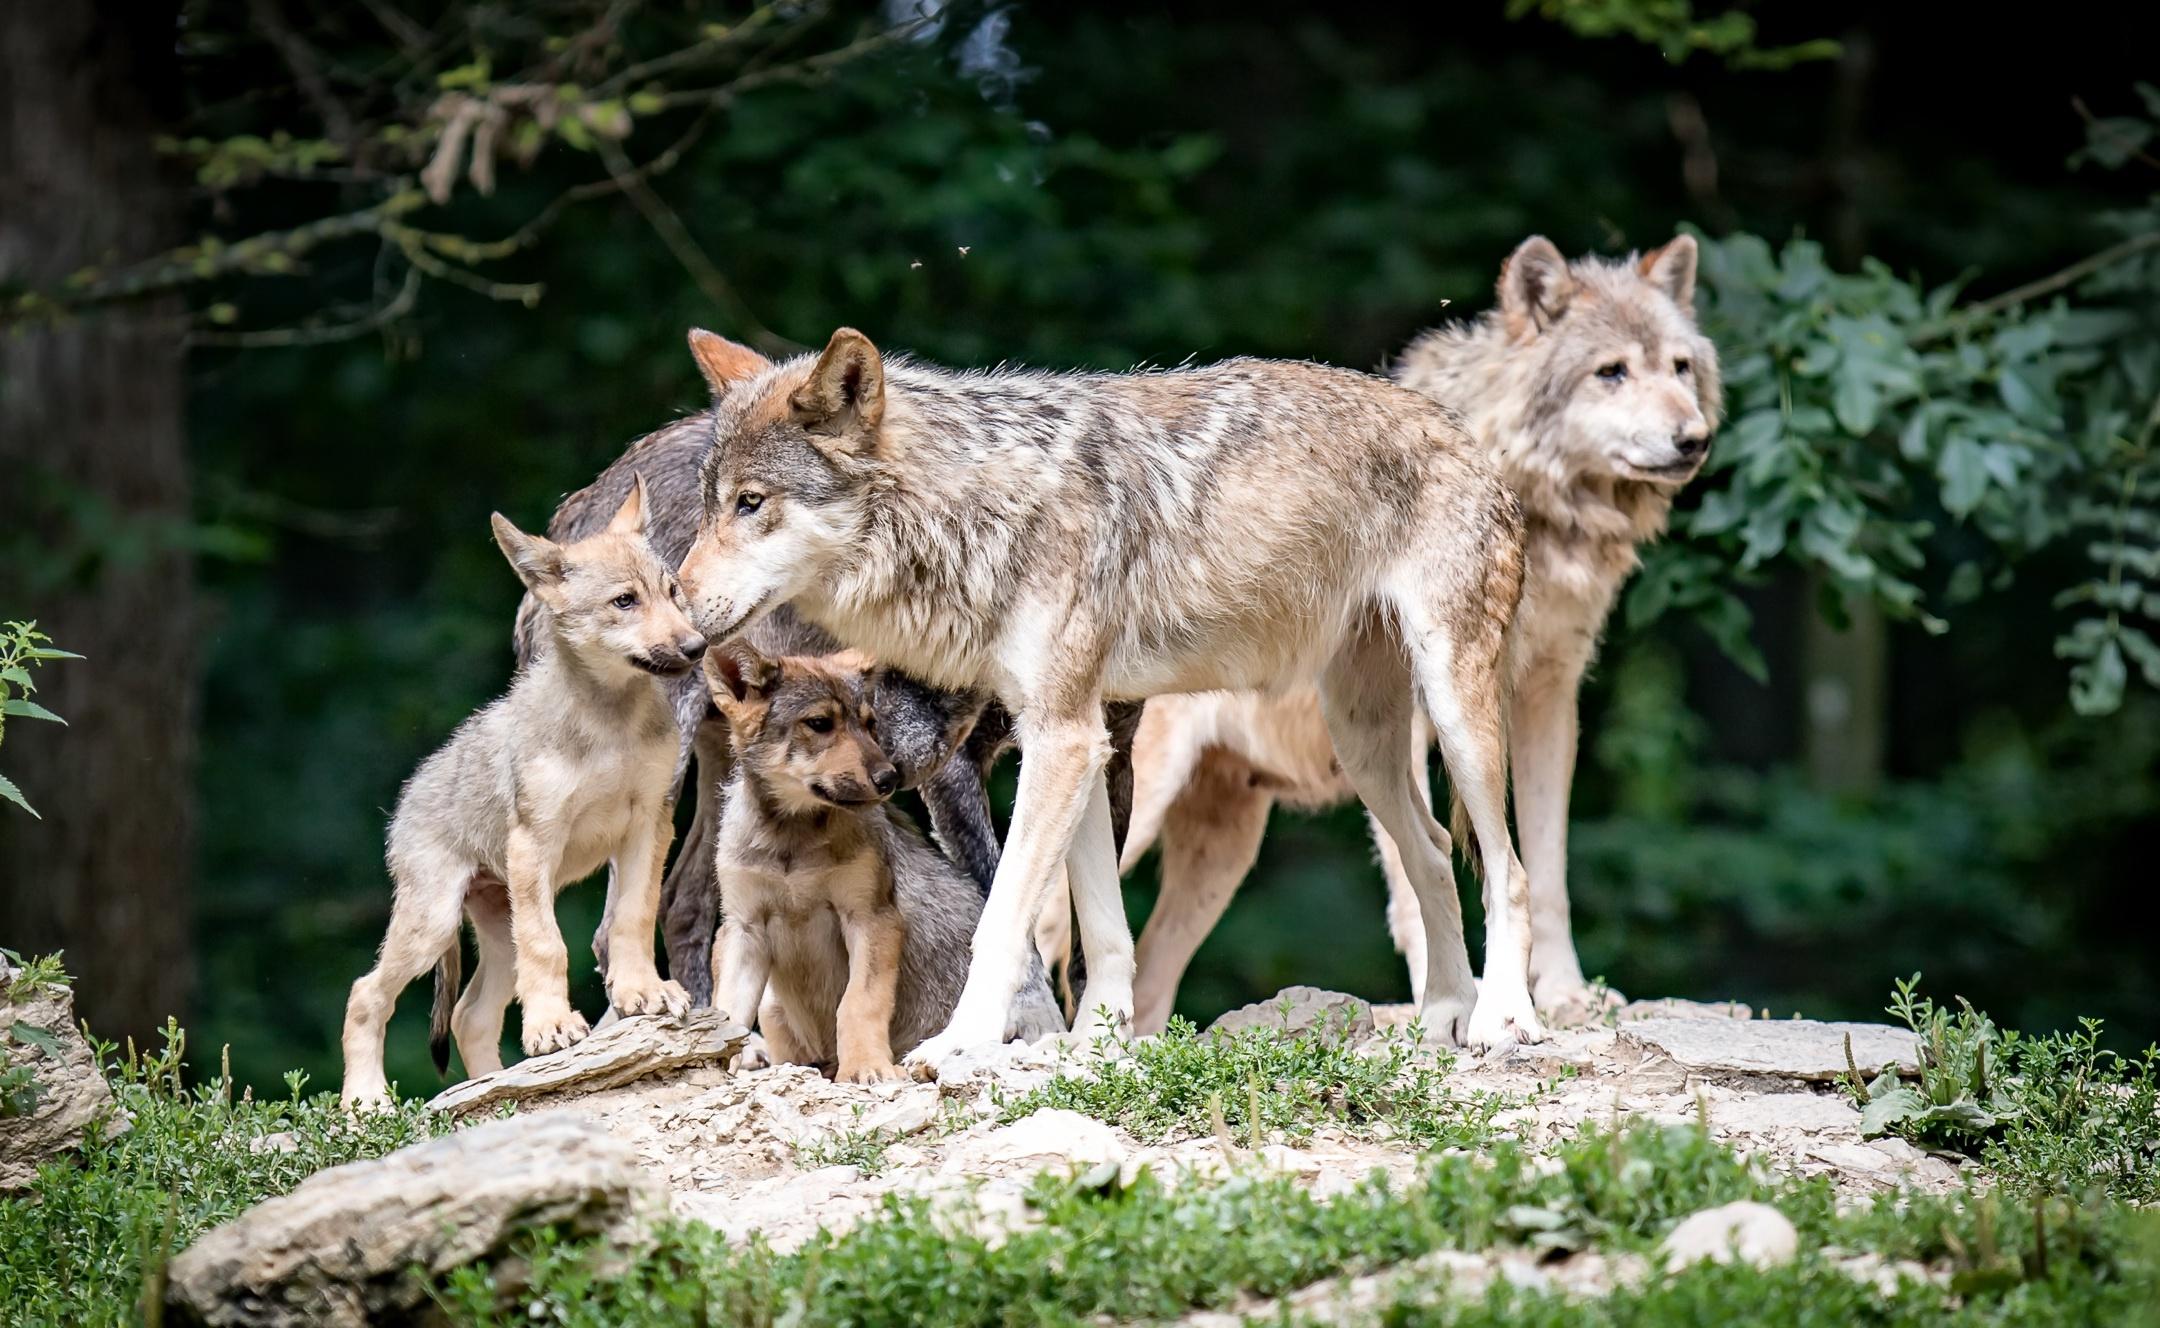 https://wallpaperscave.ru/images/original/18/03-17/animals-wolves-30295.jpg